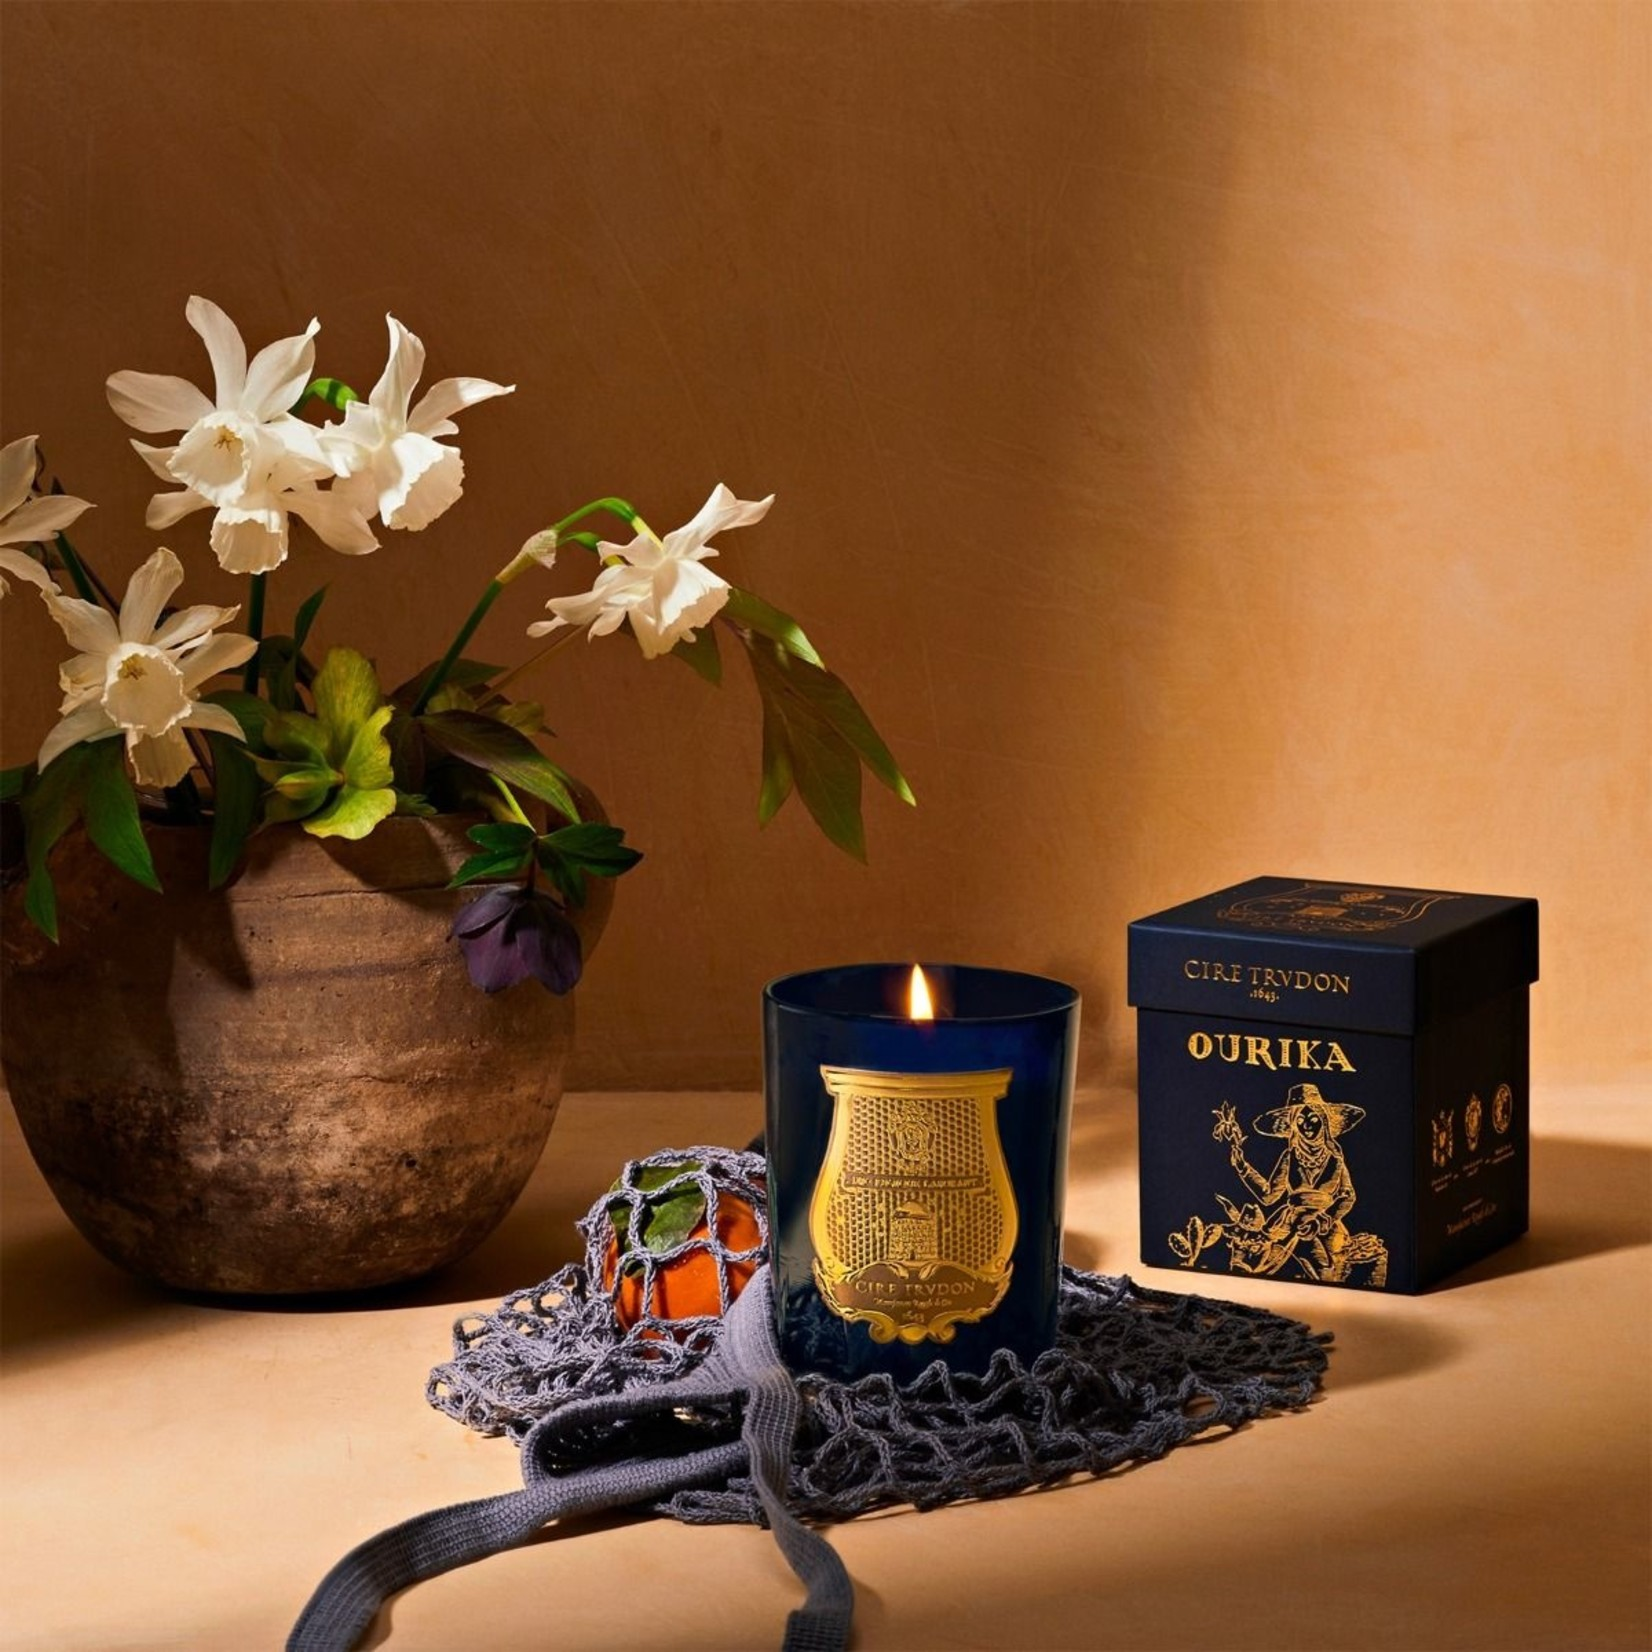 Trudon Trudon Ourika Candle — Classic